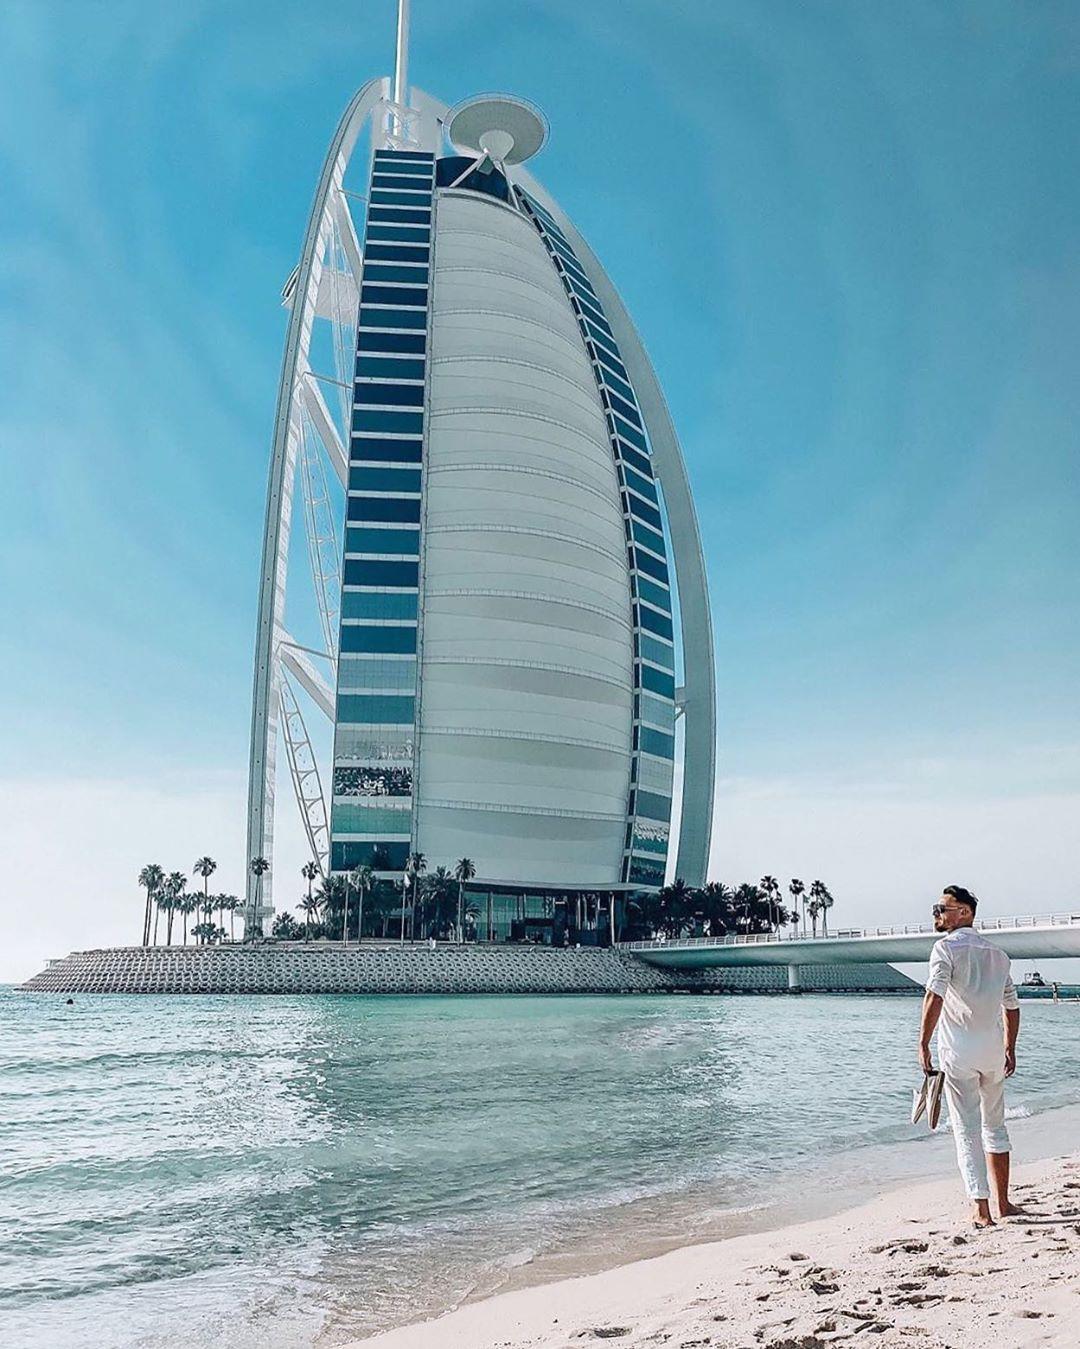 Дубай отель парус картинки mayfair hotel 3 дубай оаэ